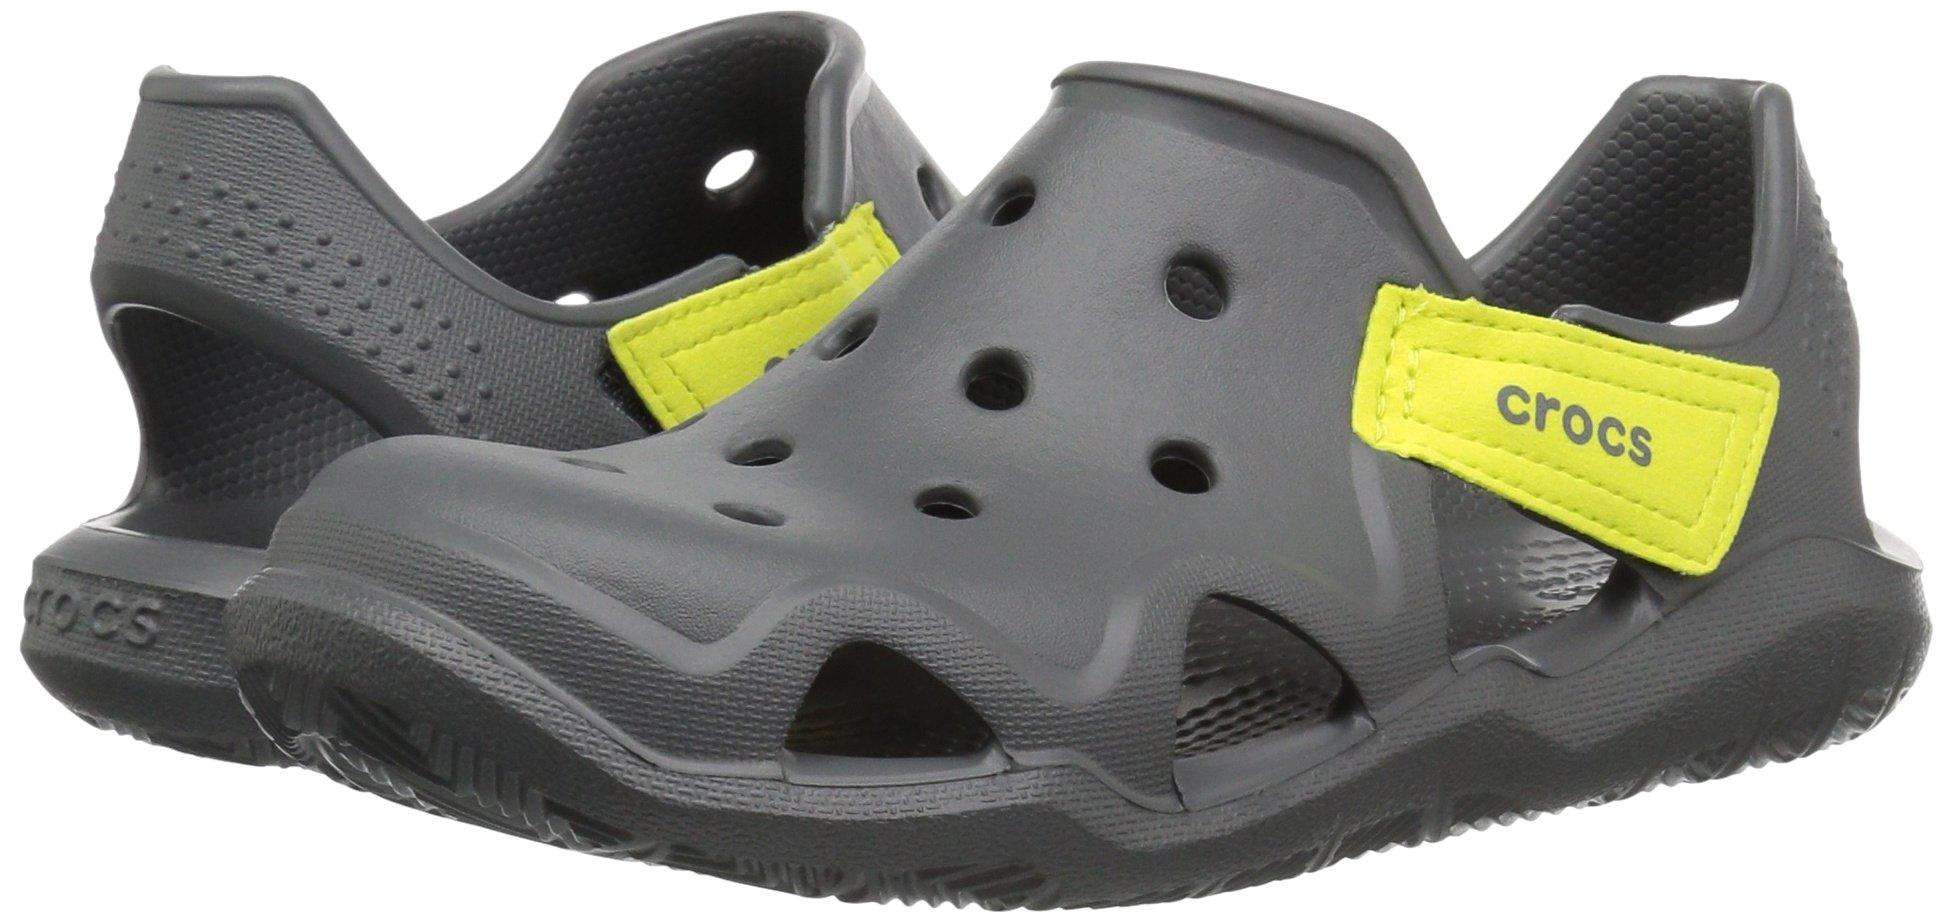 Crocs Unisex-Kids Swiftwater Wave Flat Sandal, Slate Grey/Tennis Ball Green, 13 M US Little Kid by Crocs (Image #6)